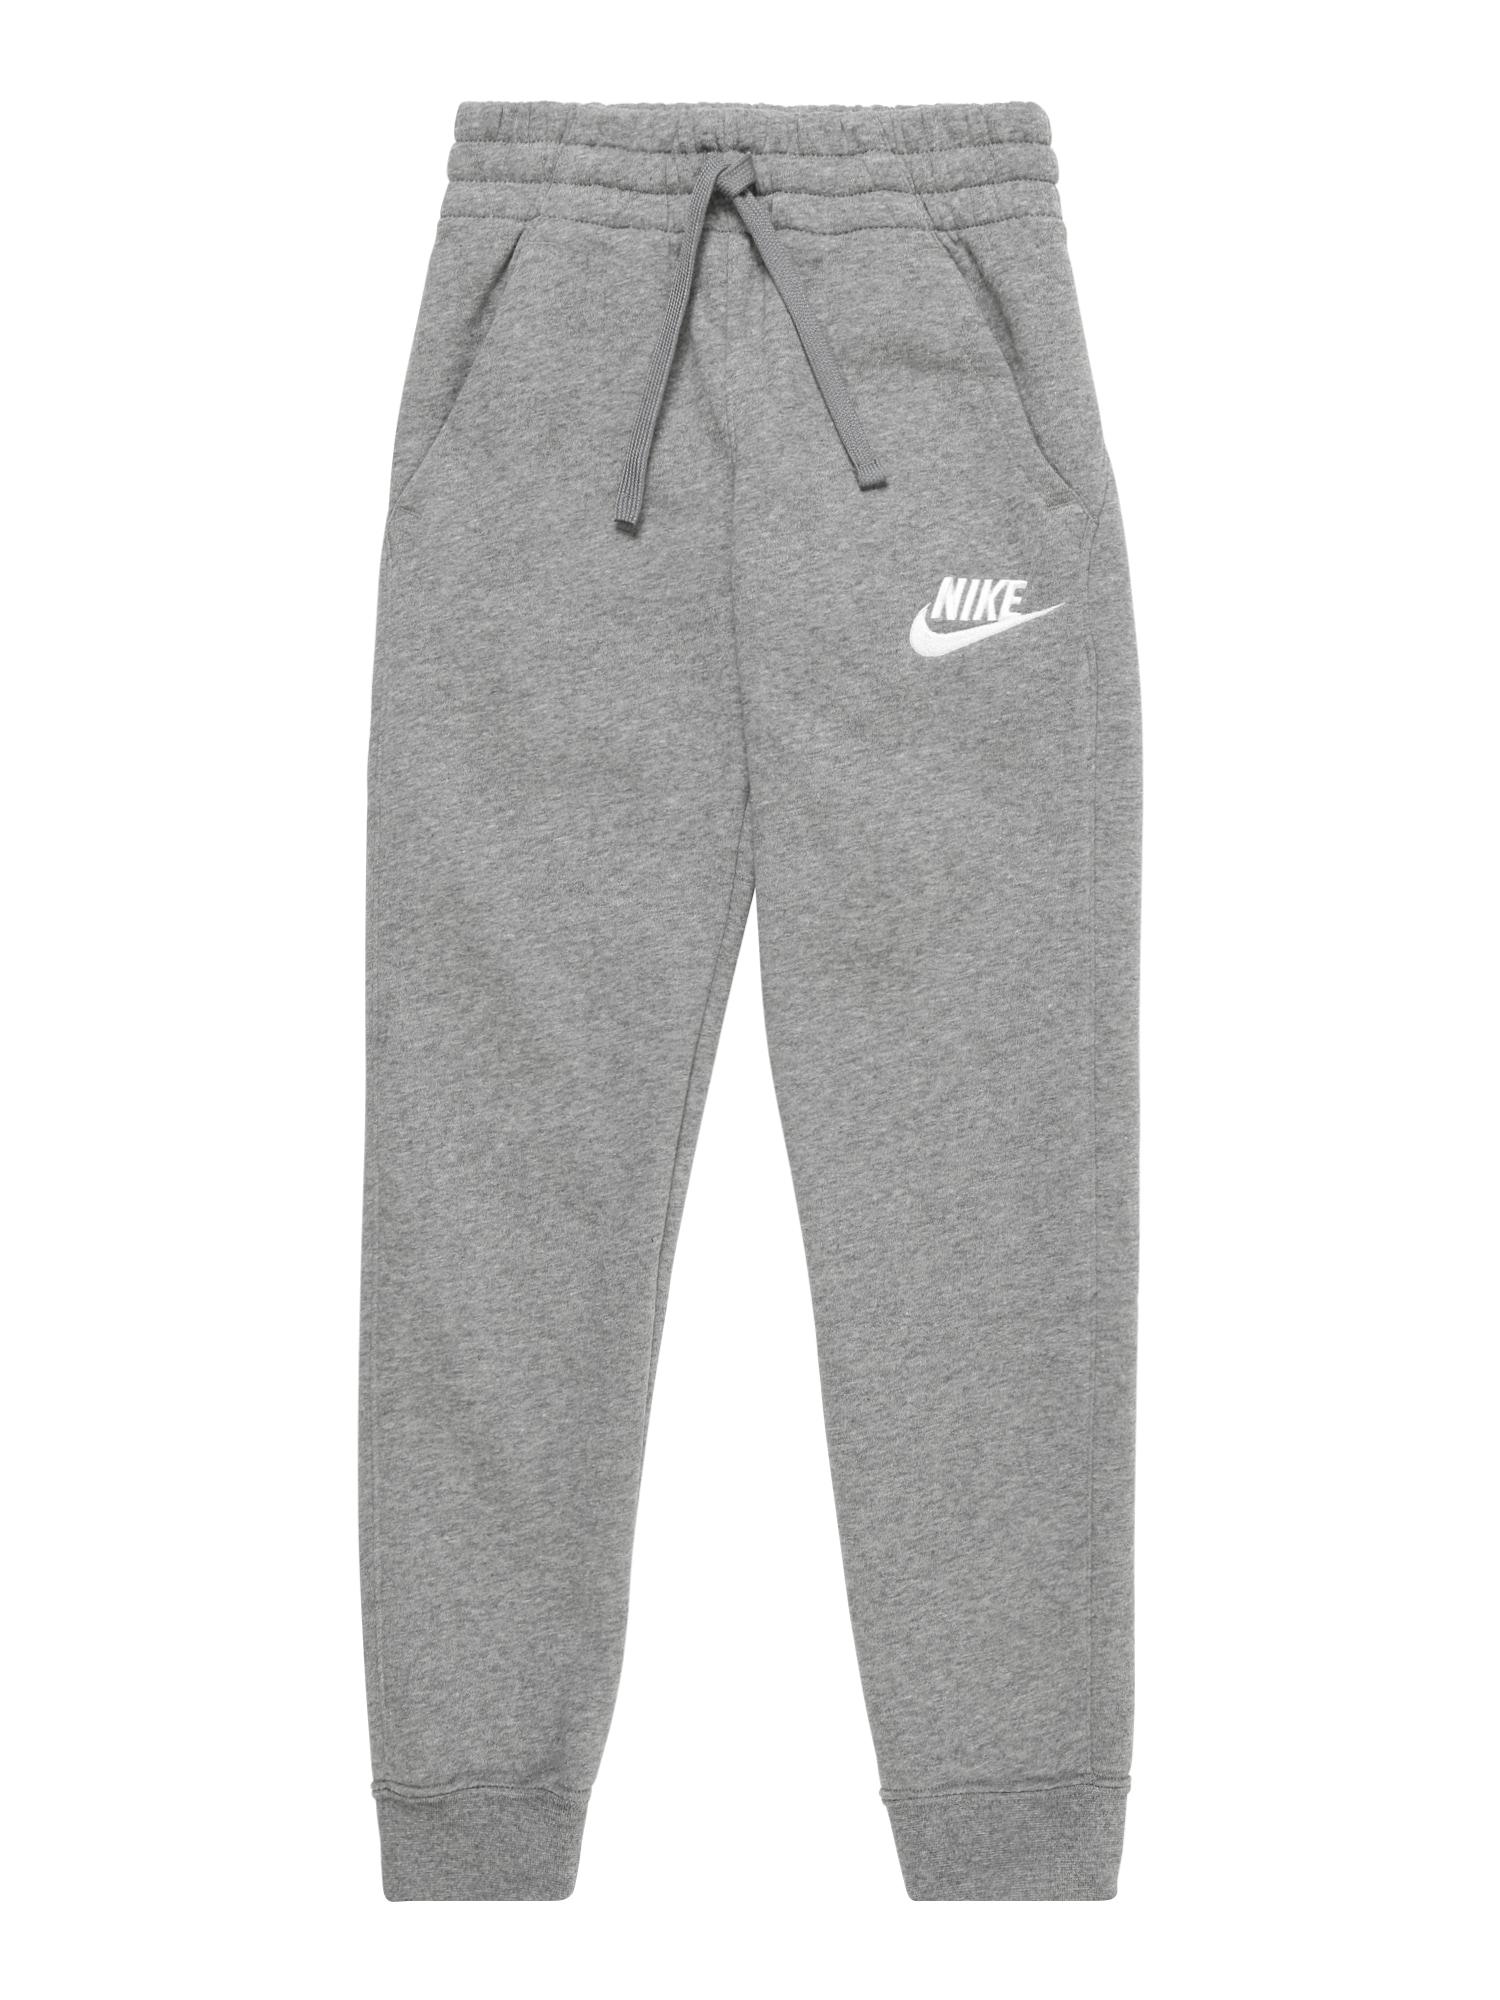 Nike Sportswear Kelnės pilka